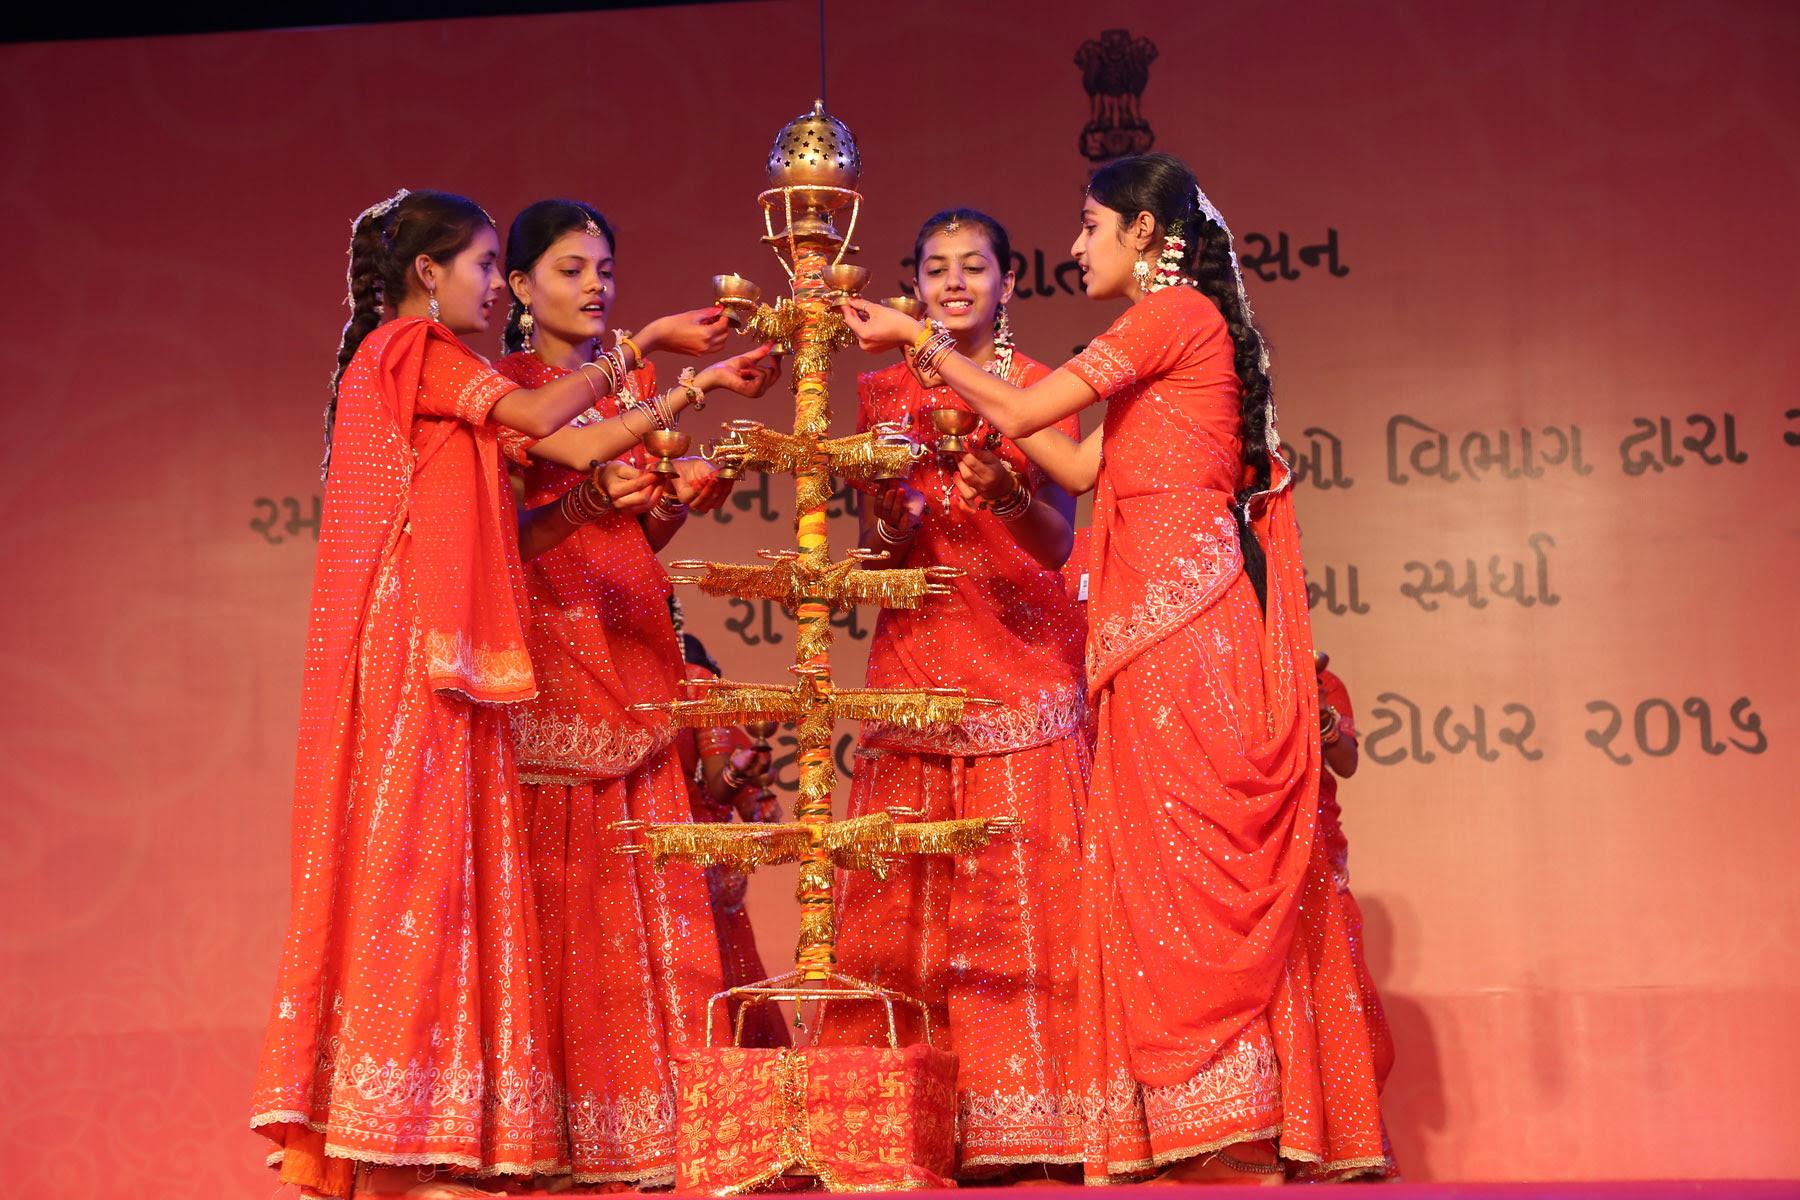 cultural-festivals/navratri-festival-Gujrat-2